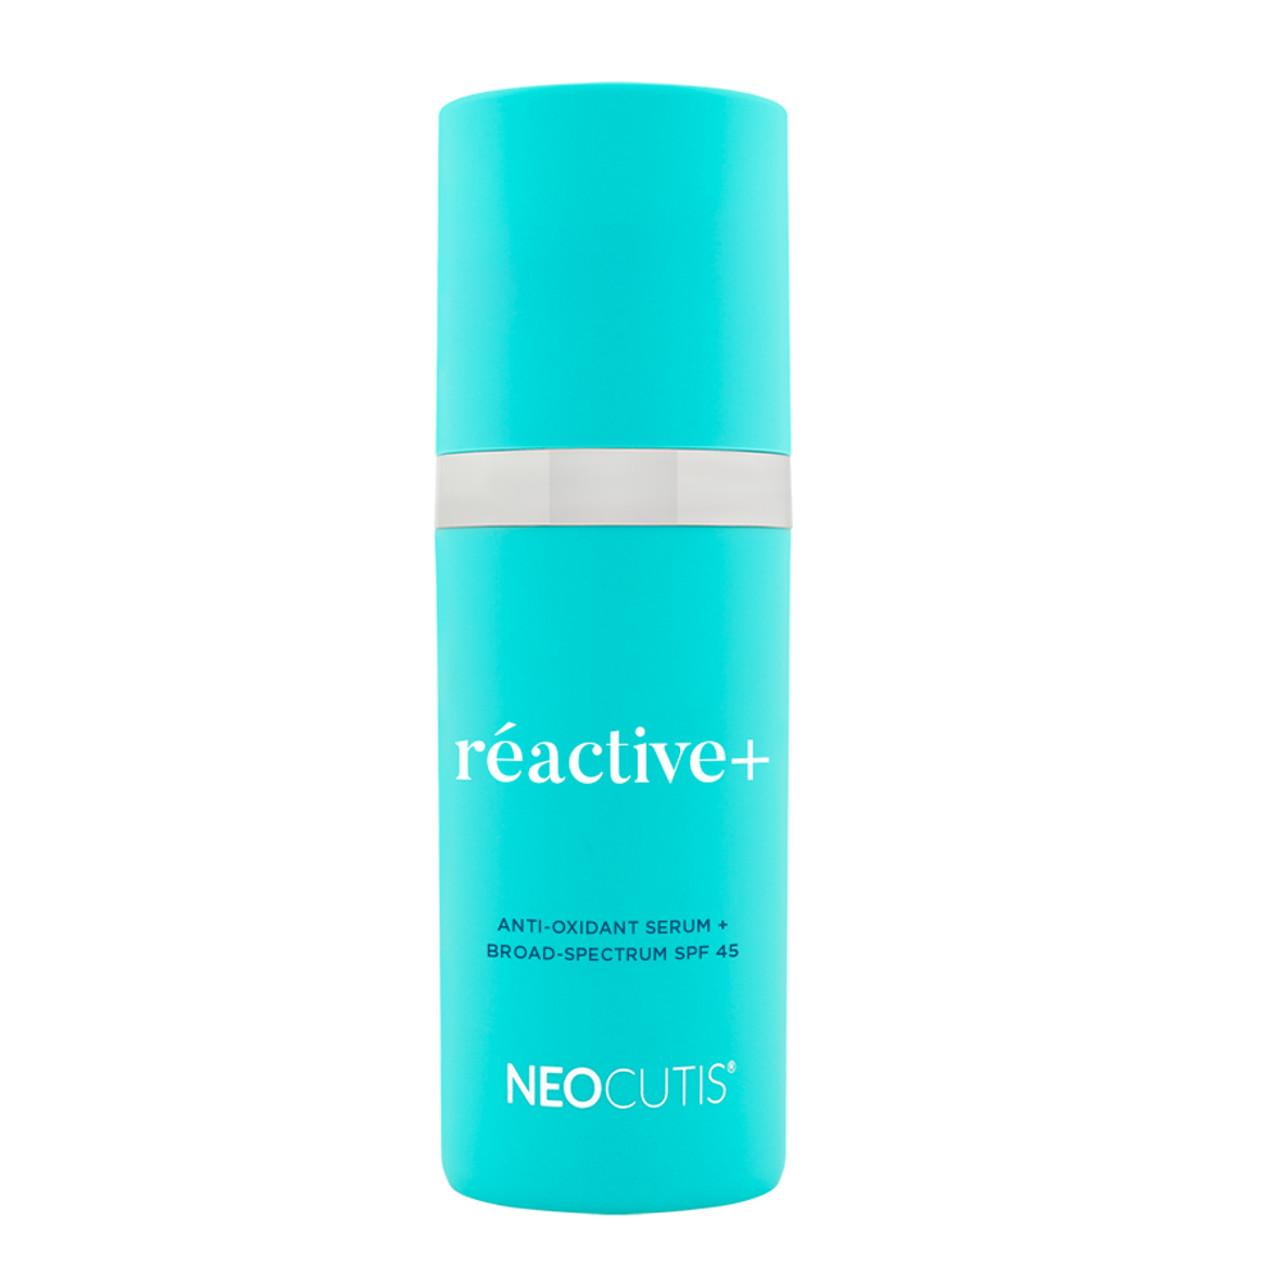 Neocutis ReActive+ Anti-Oxidant Serum+ Broad Spectrum SPF 45